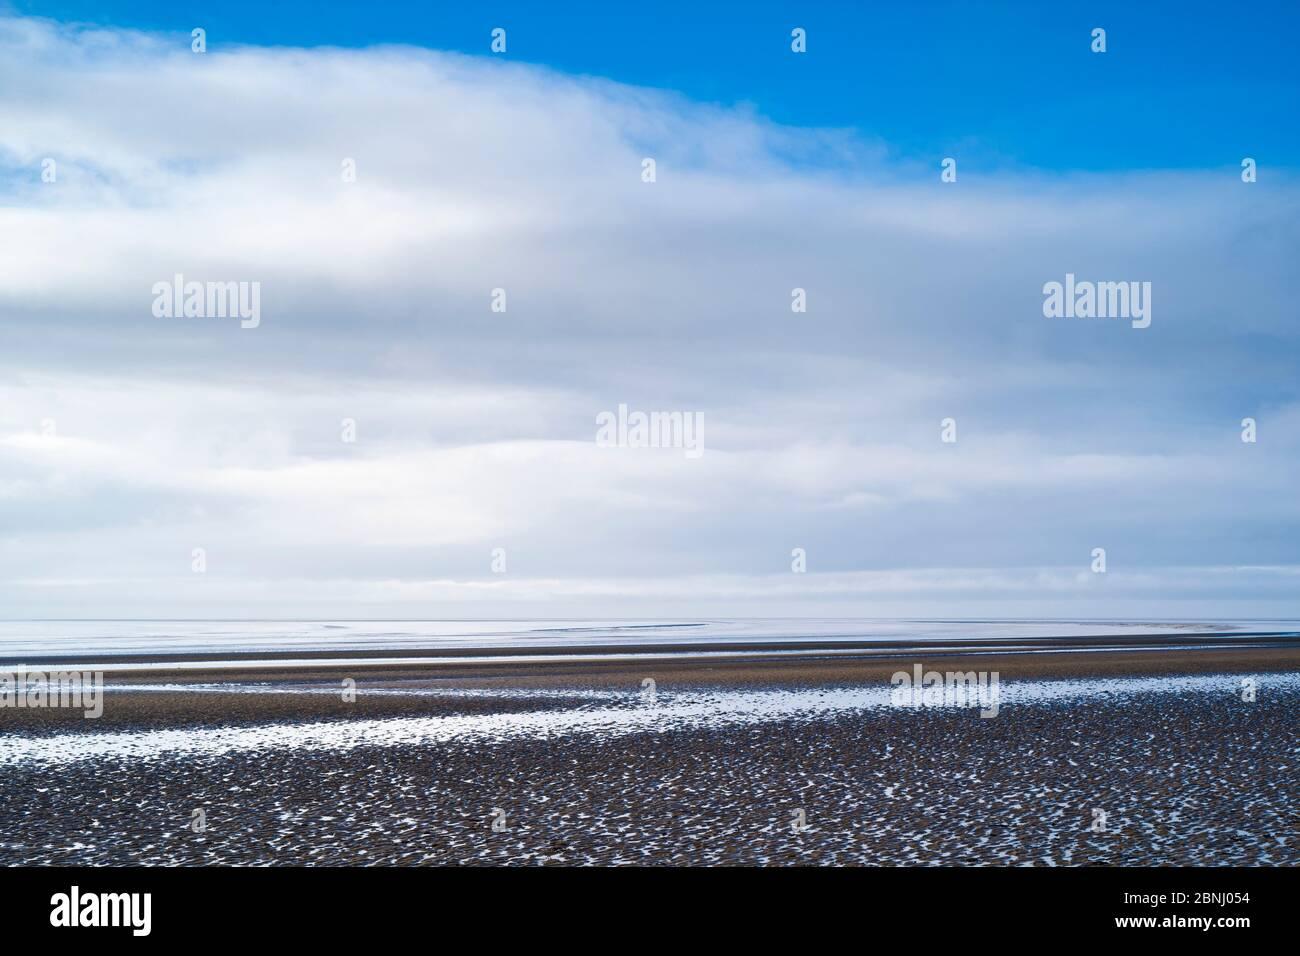 Pastel shades of sea and sandy beach of the Bristol Channel at Burnham-on-Sea seashore, Somerset, UK Stock Photo